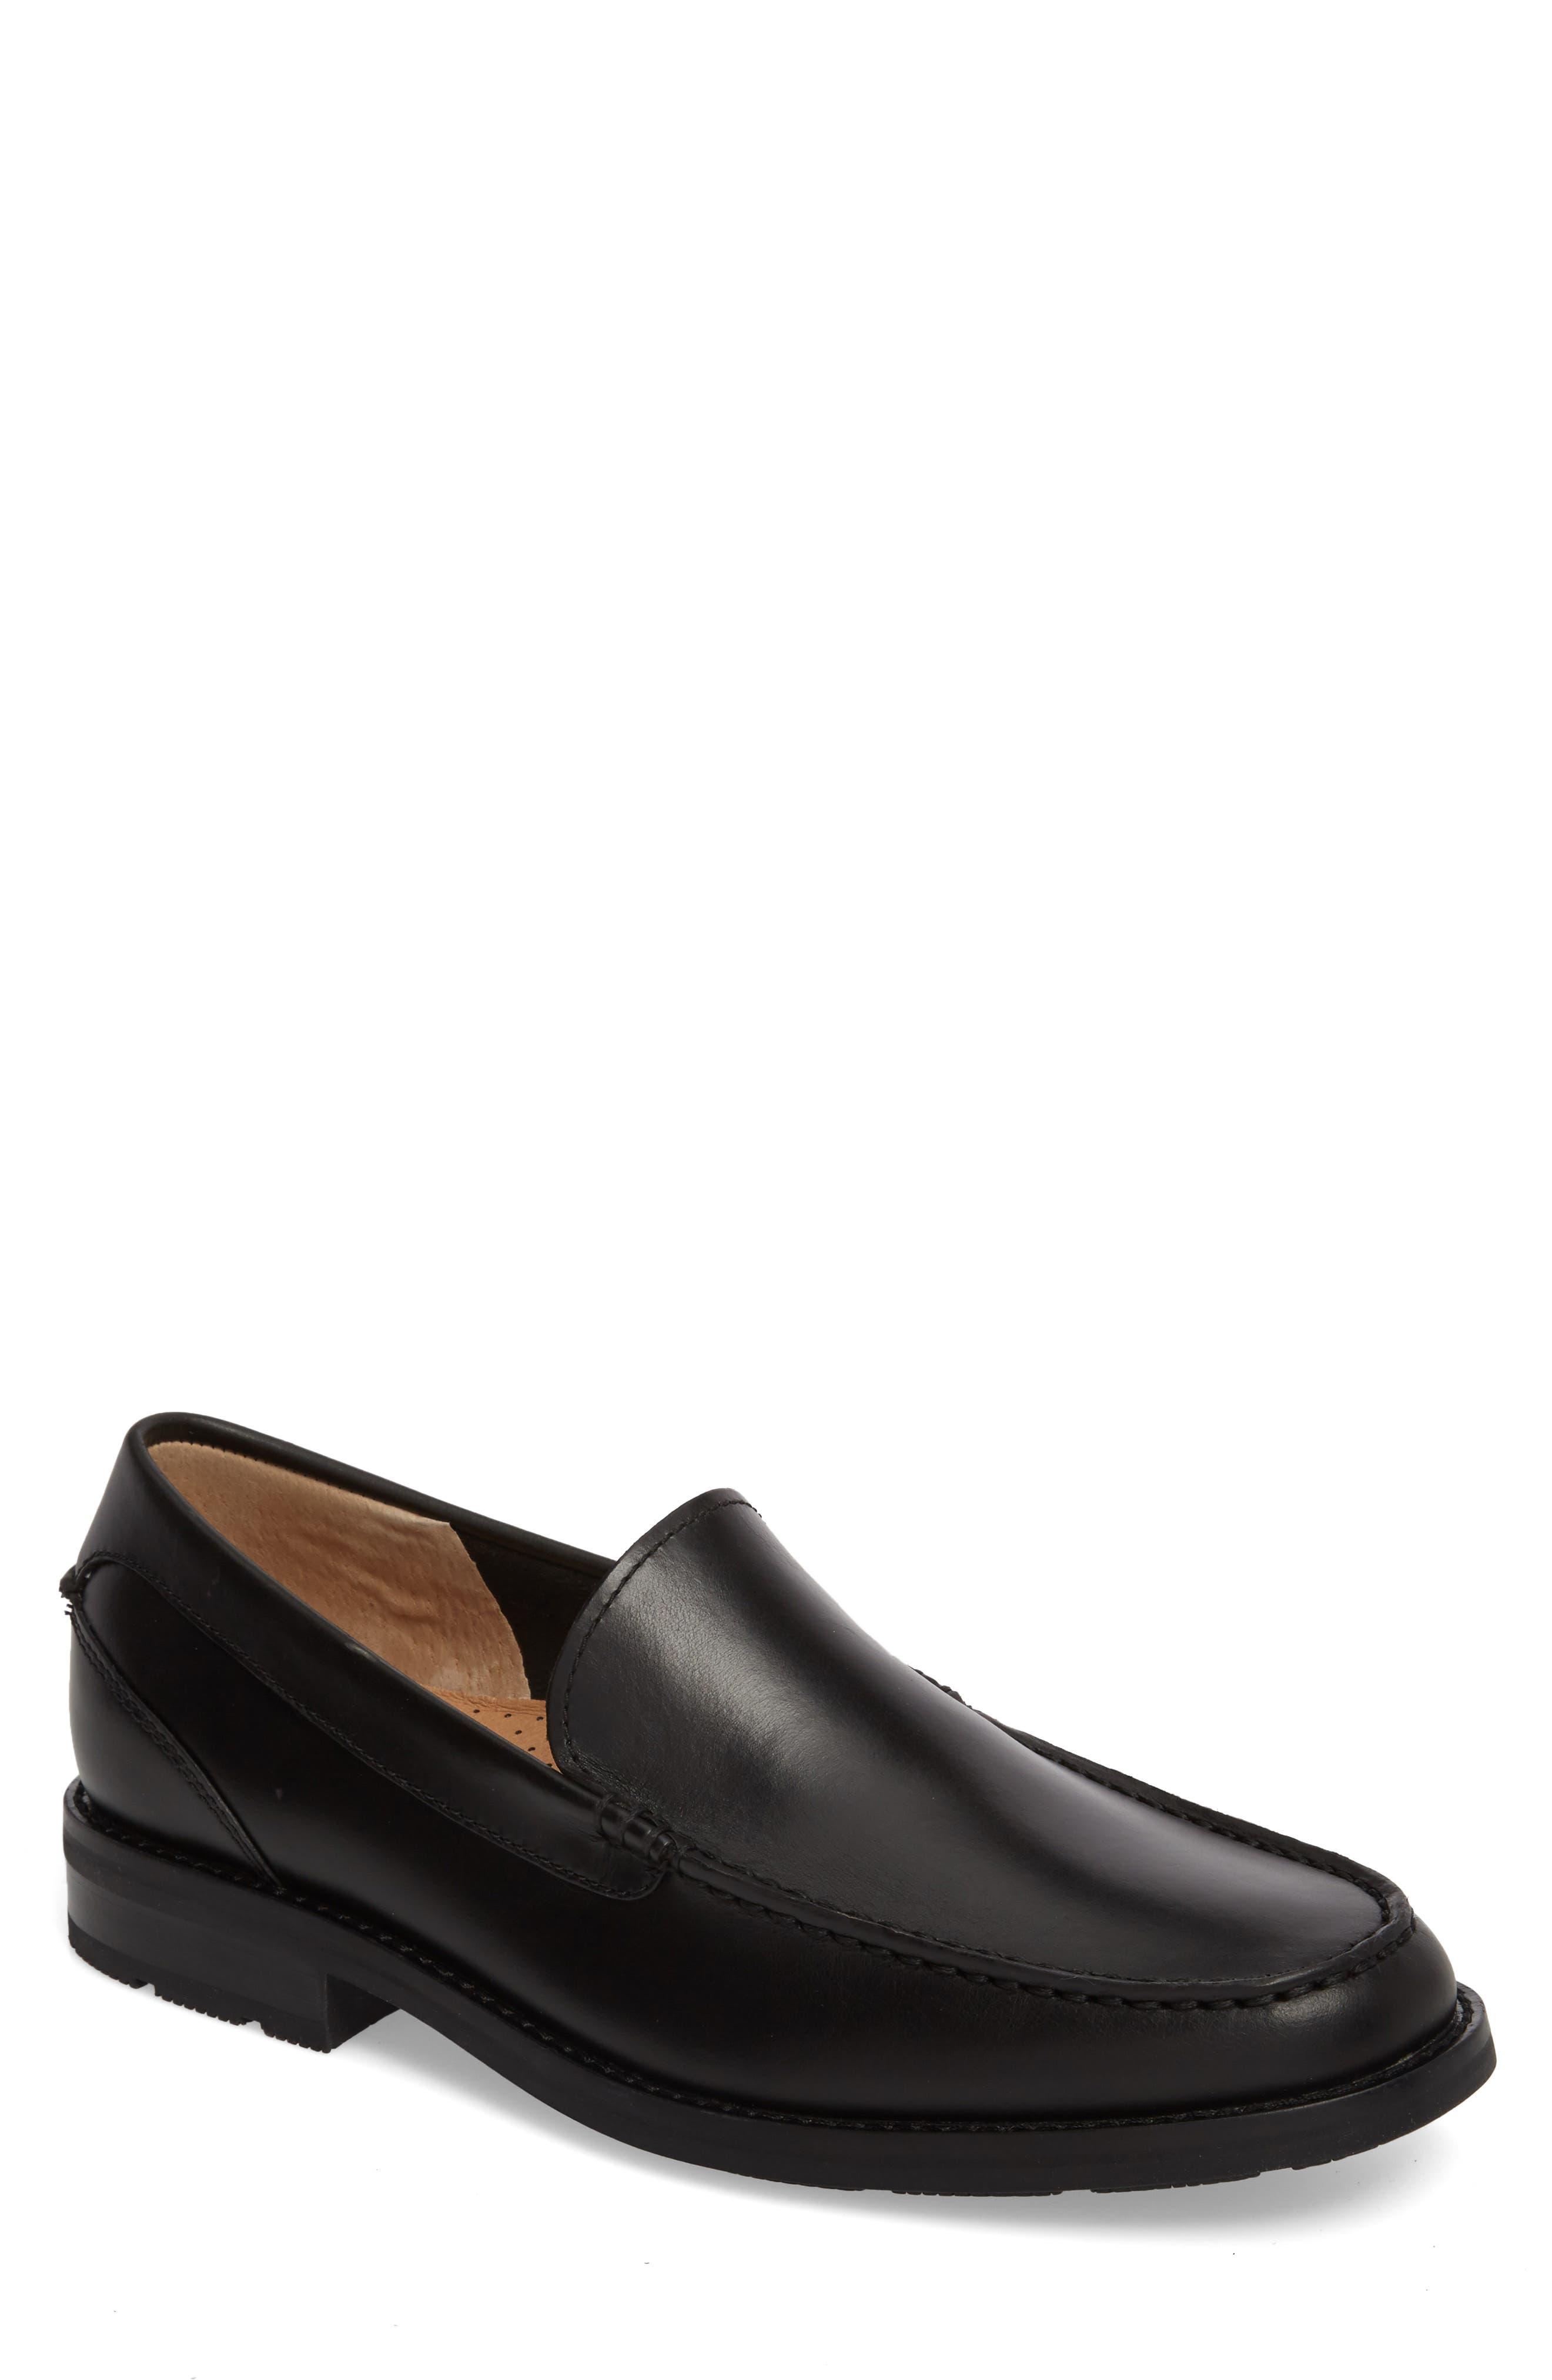 Essex Venetian Loafer,                         Main,                         color, BLACK LEATHER